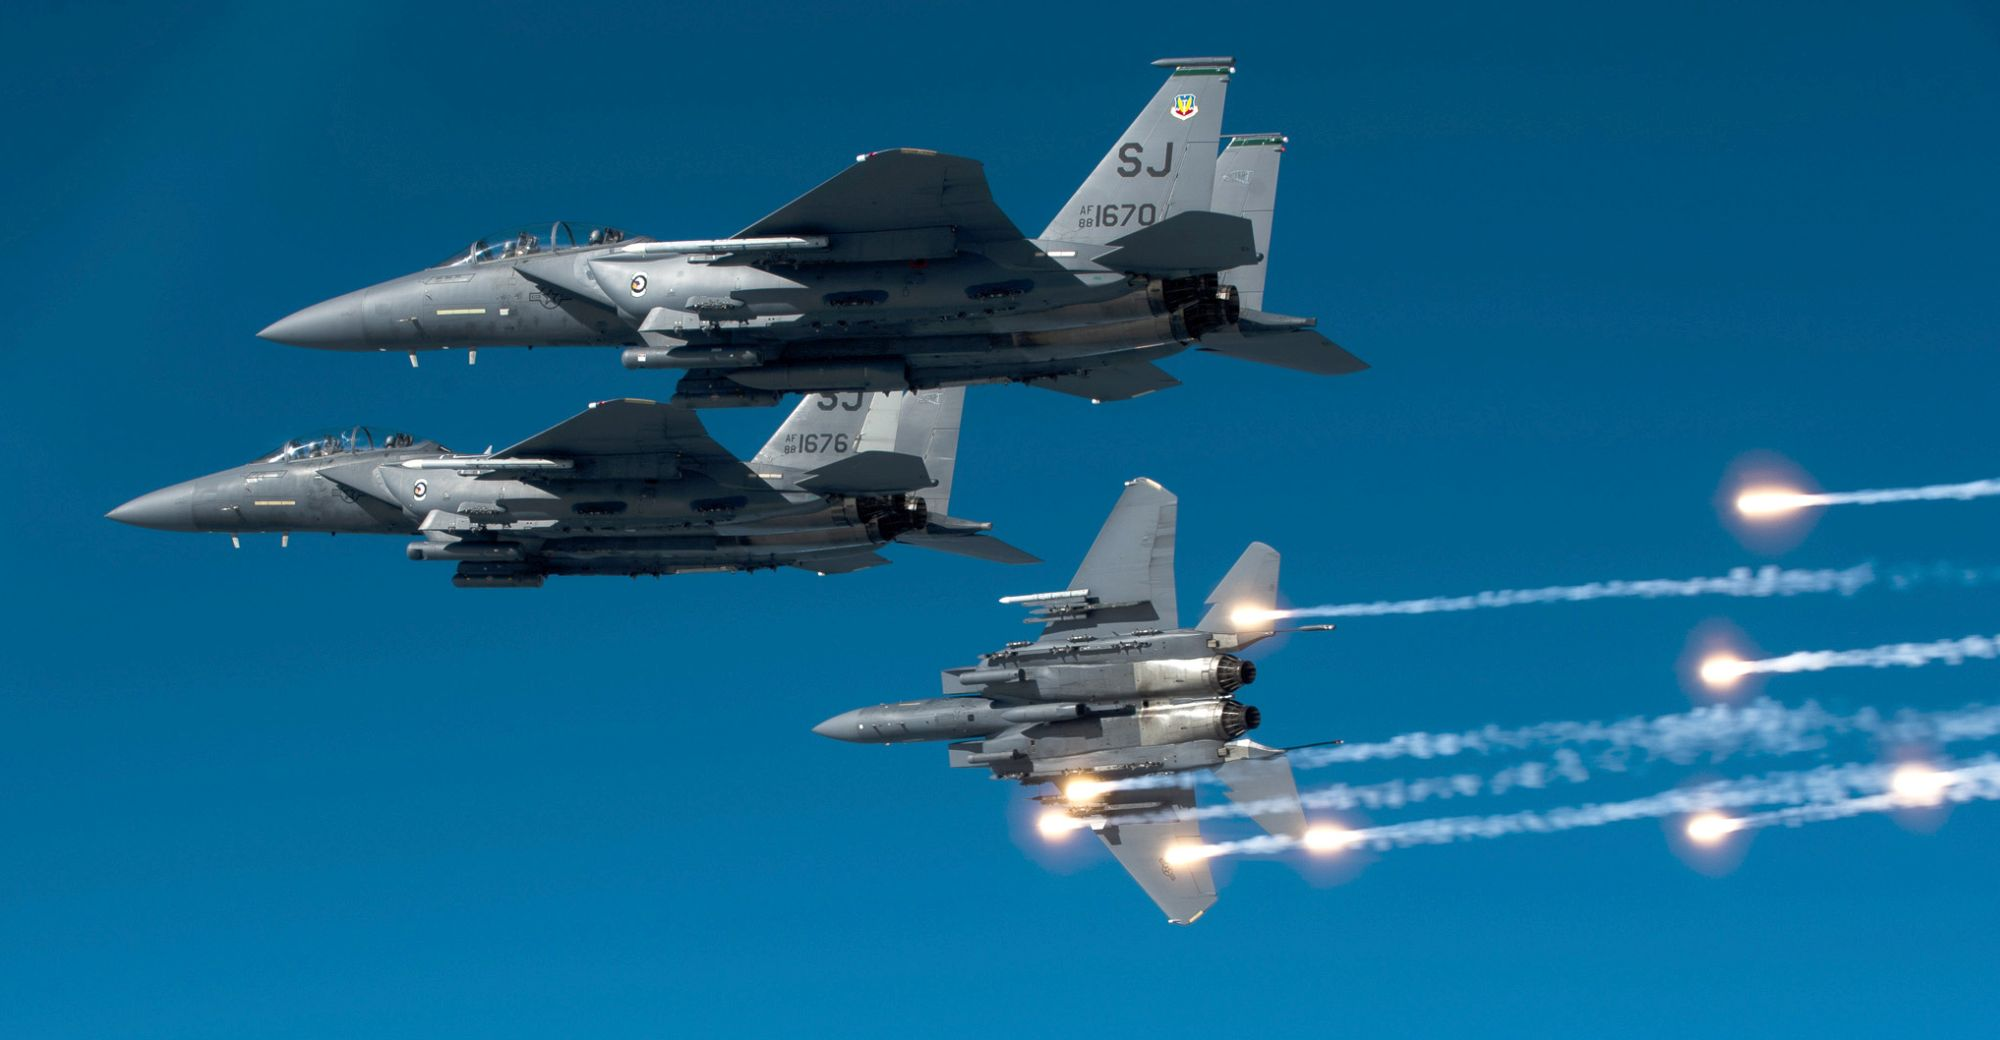 F-15E w trakcie lotu szkoleniowego na Karoliną Północną (fot. US Air Force / Staff Sgt. Michael B. Keller)